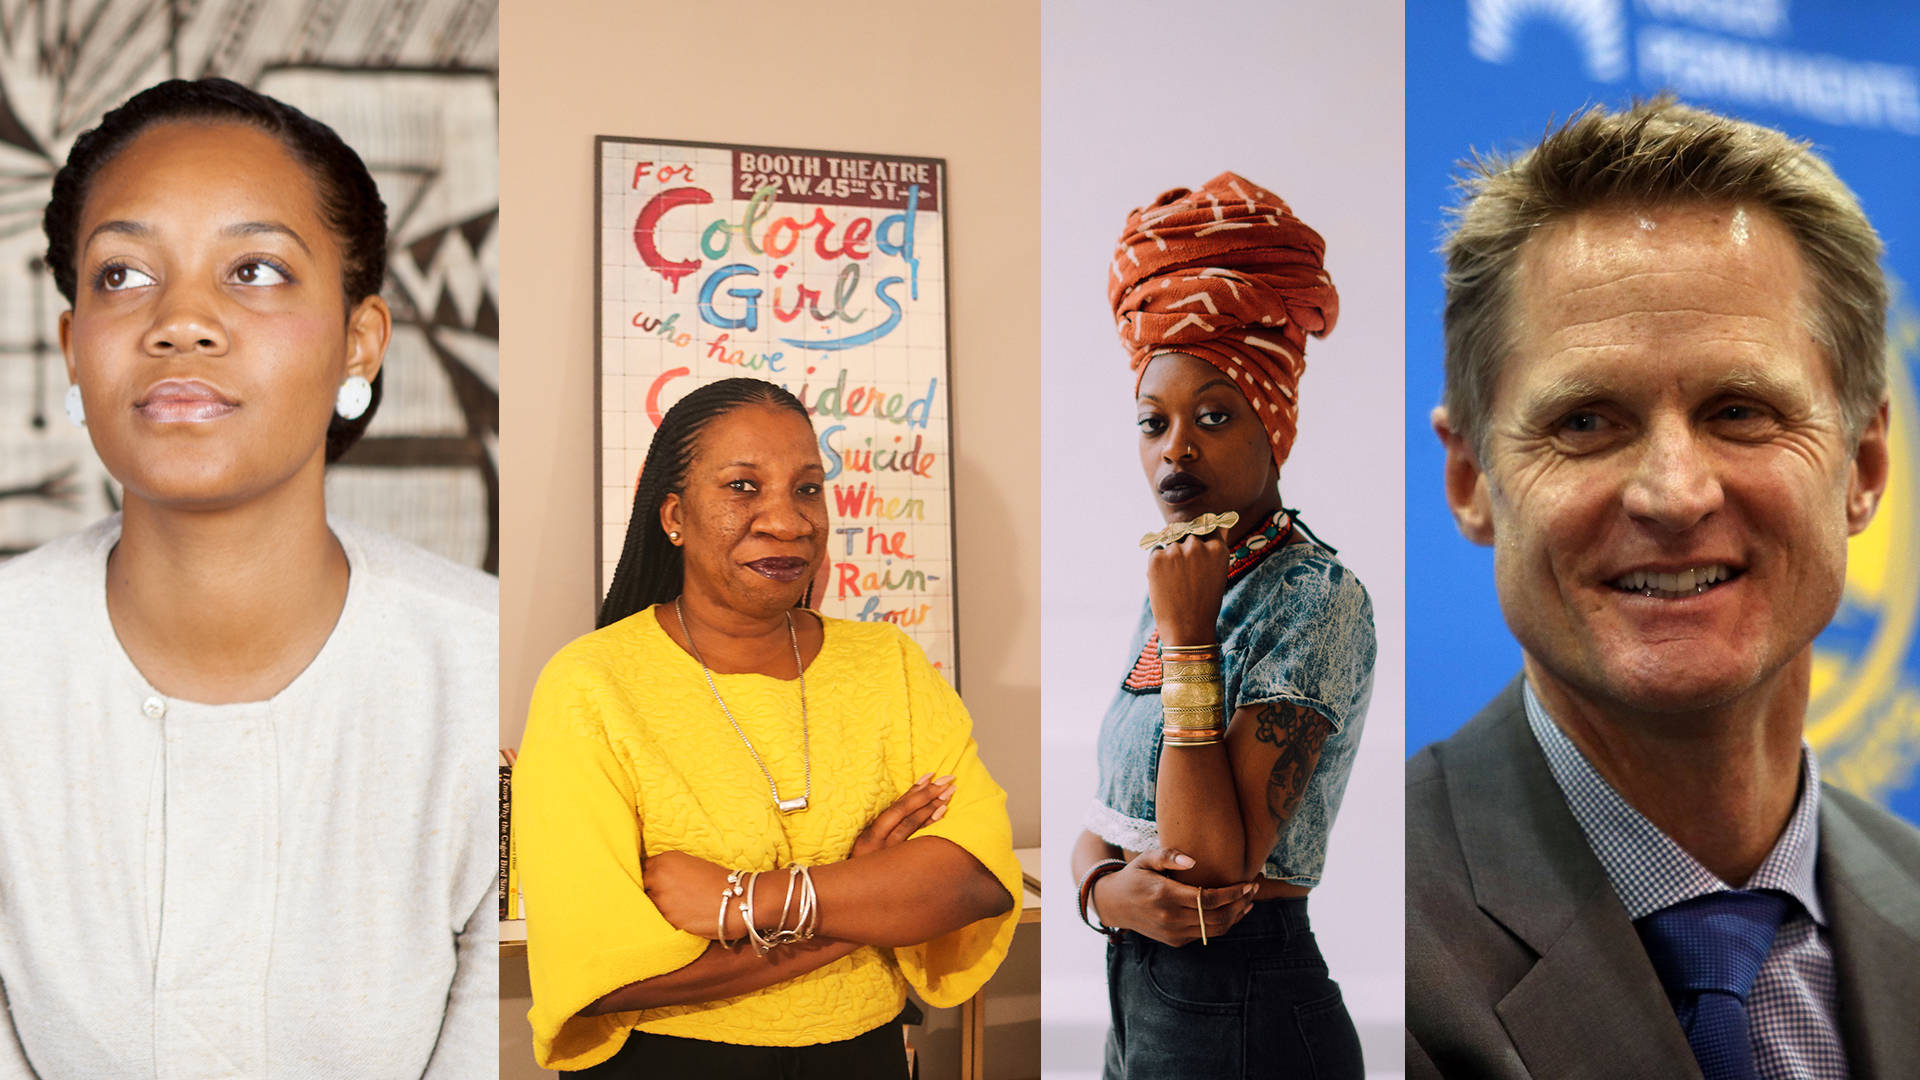 Chinaka Hodge, Tarana Burke, Brittsense and Steve Kerr are four of the honorees on the YBCA 100 list of influencers. Photos courtesy of YBCA; collage by Nastia Voynovskaya